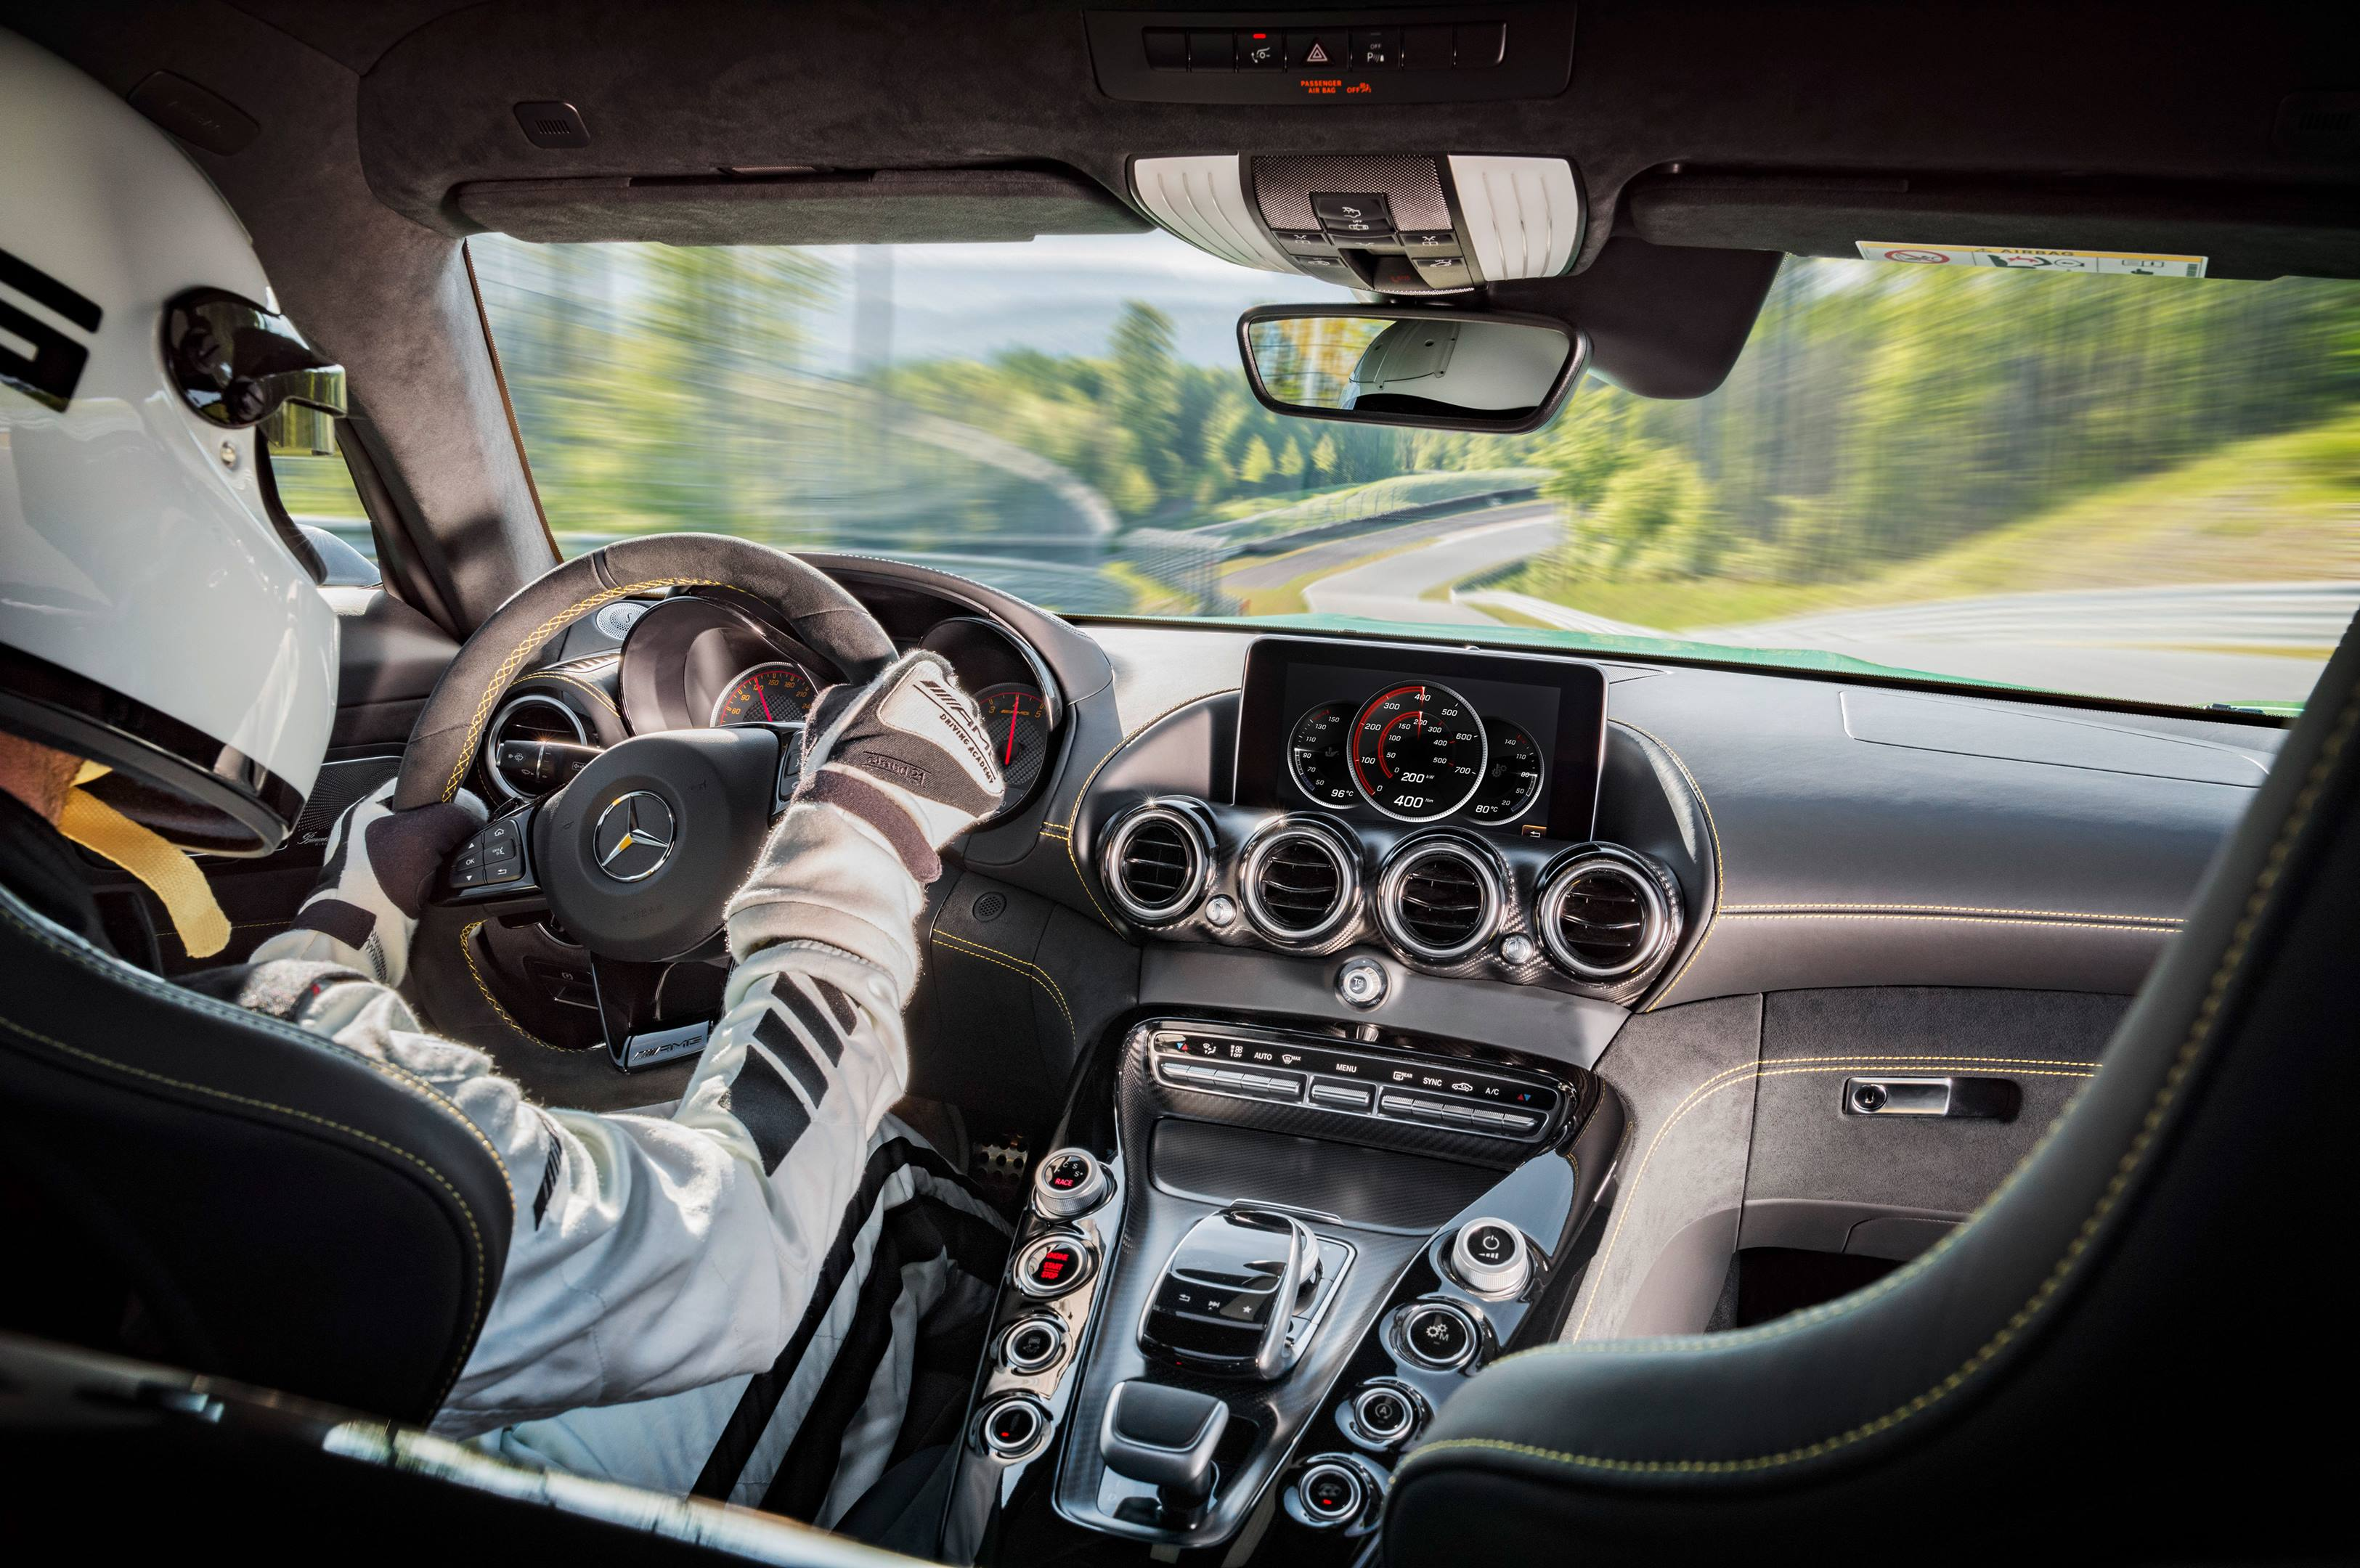 2018 Mercedes-AMG GT R dashboard view